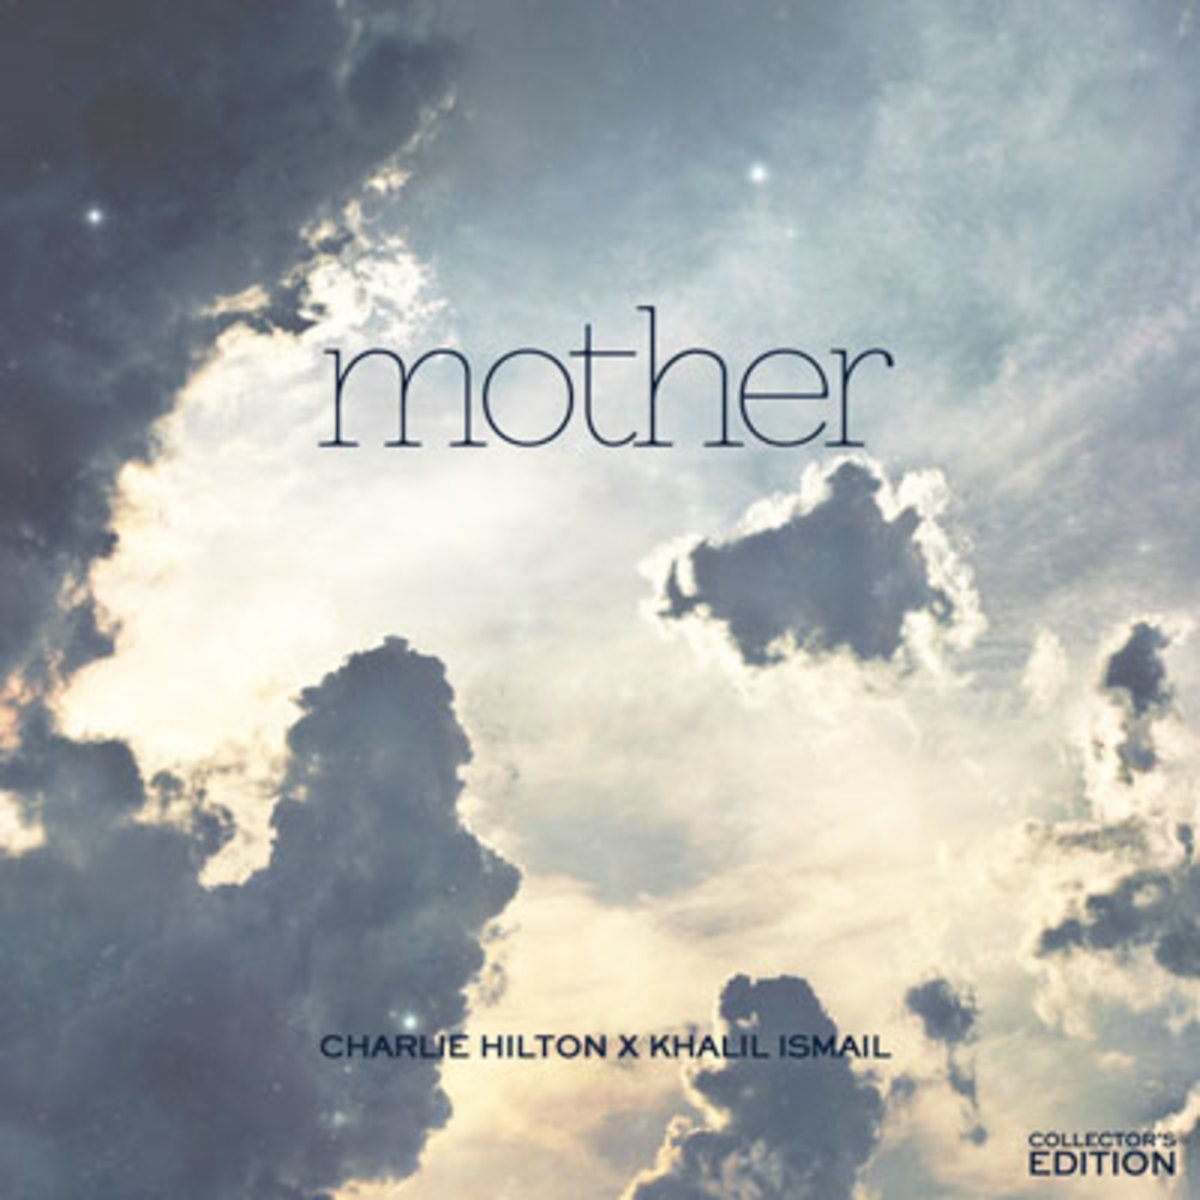 charliehilton-mother.jpg